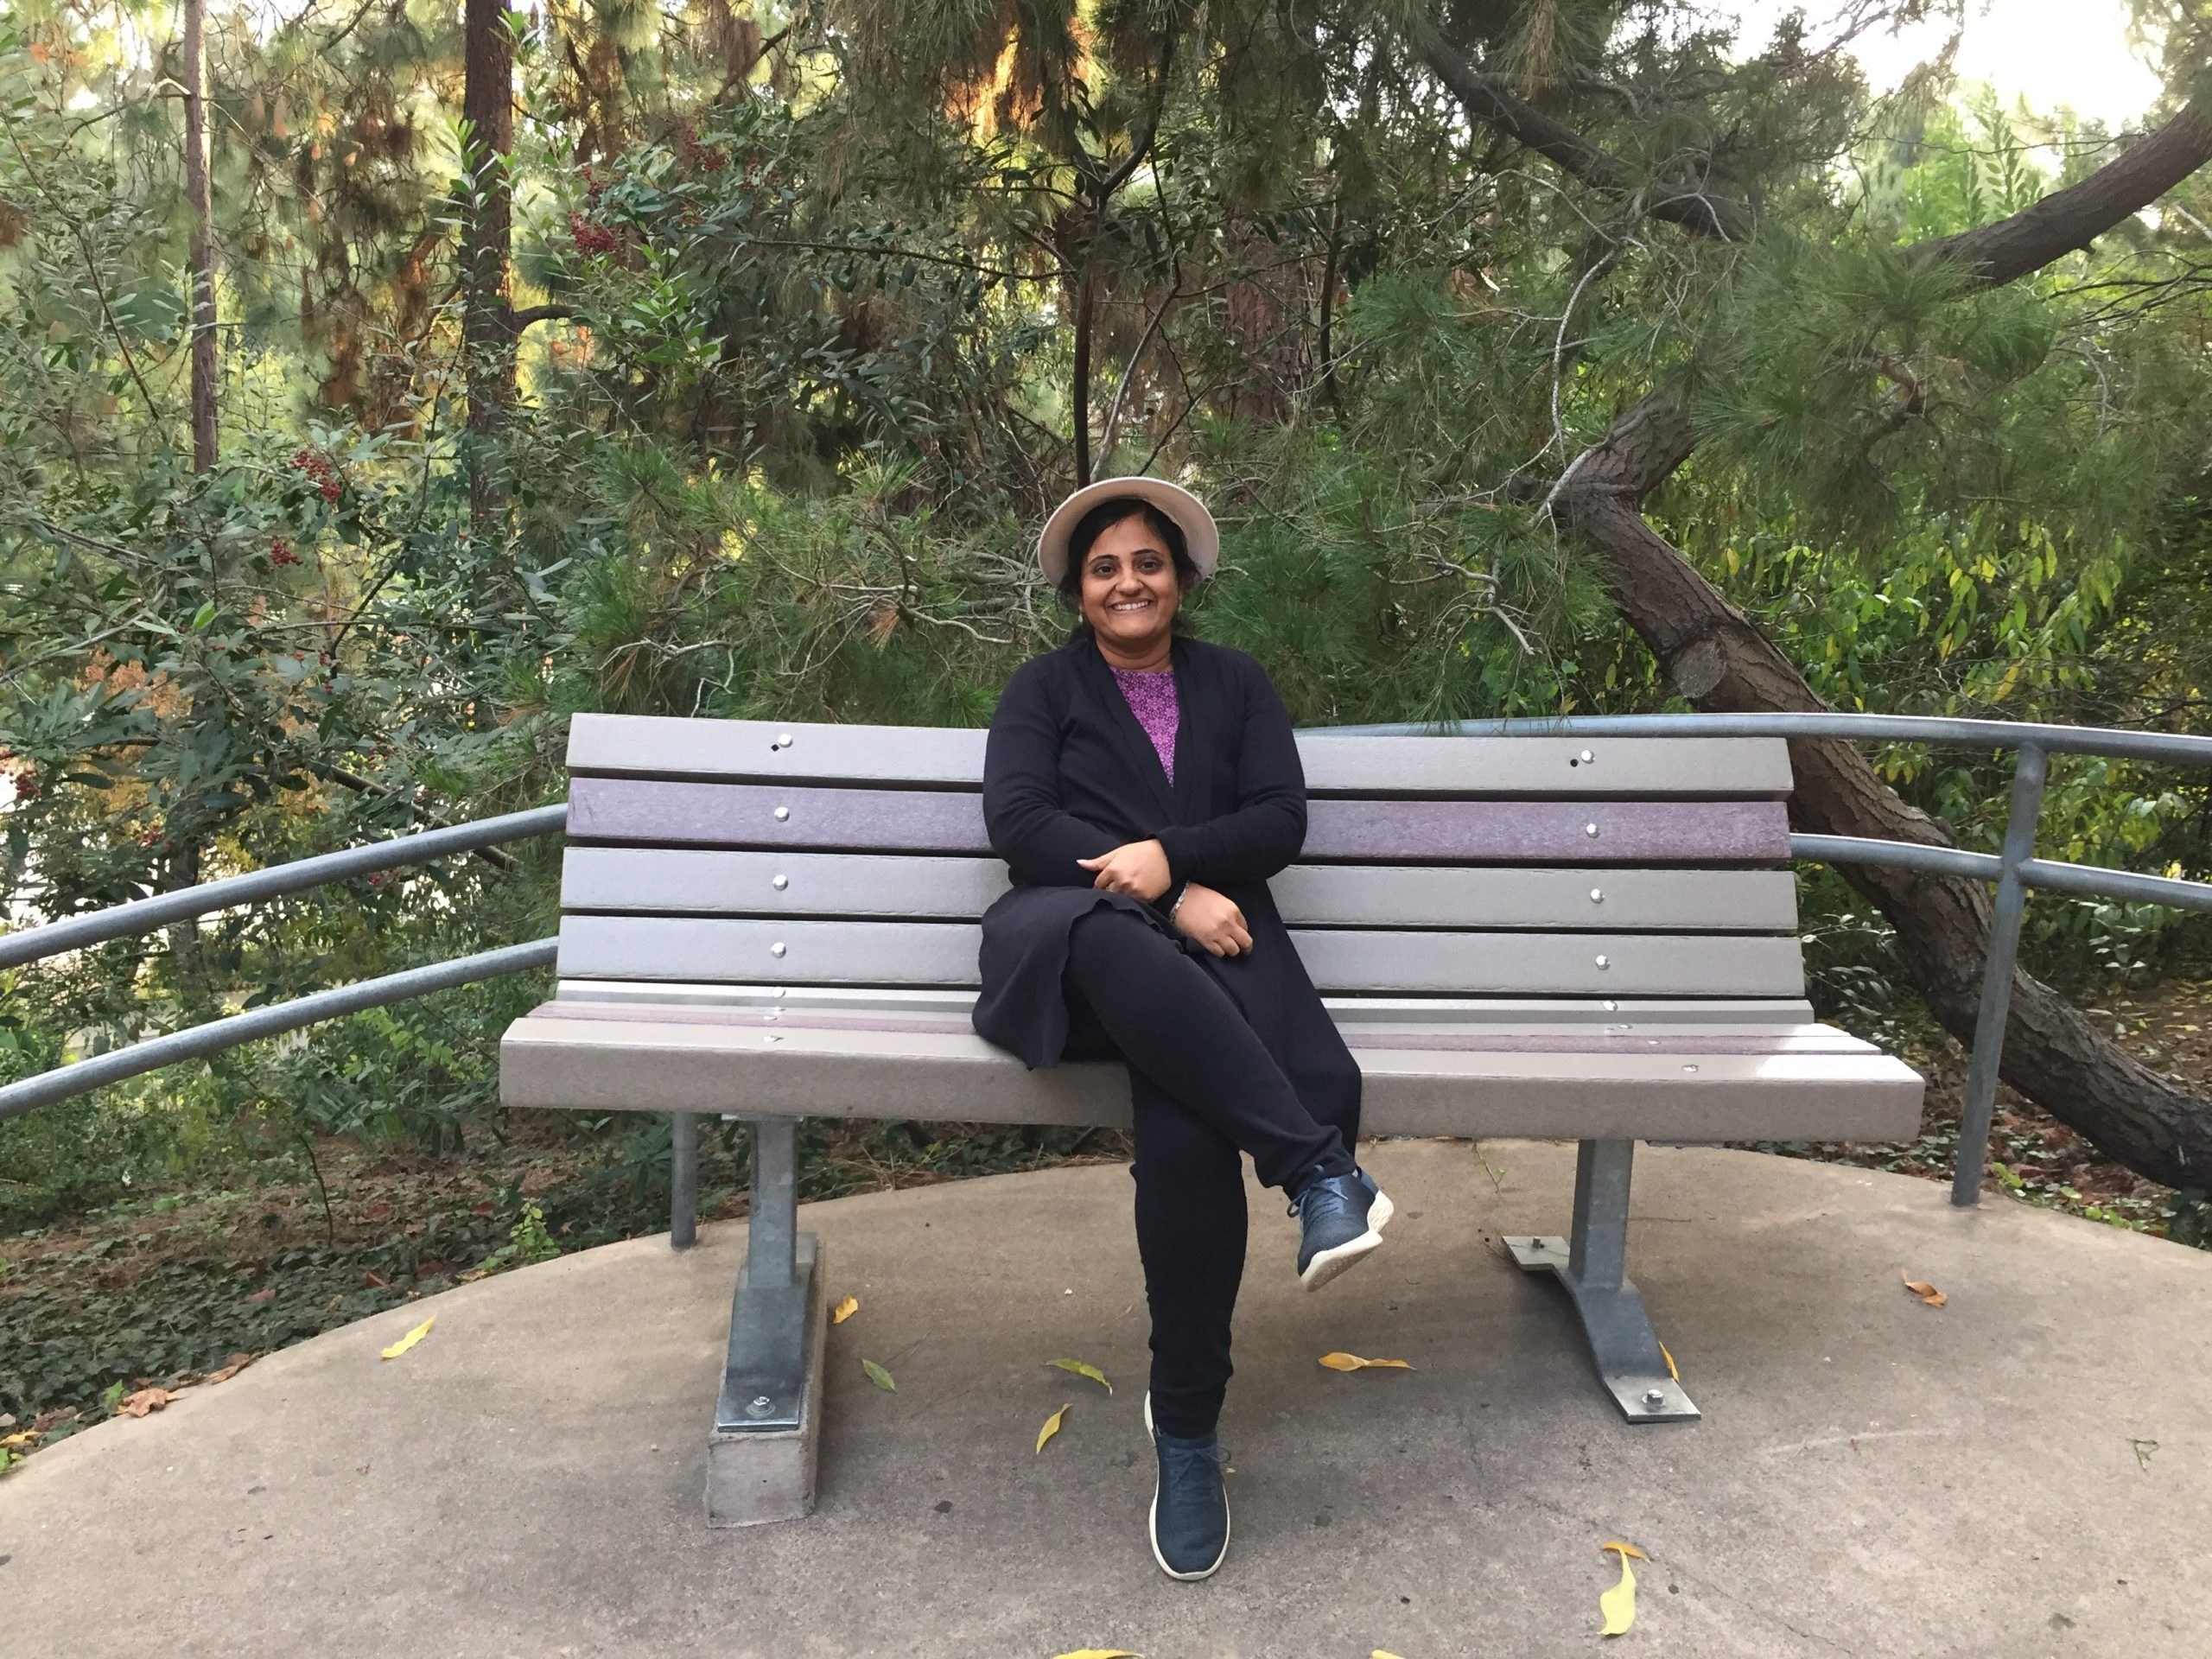 Anantha Alagappan